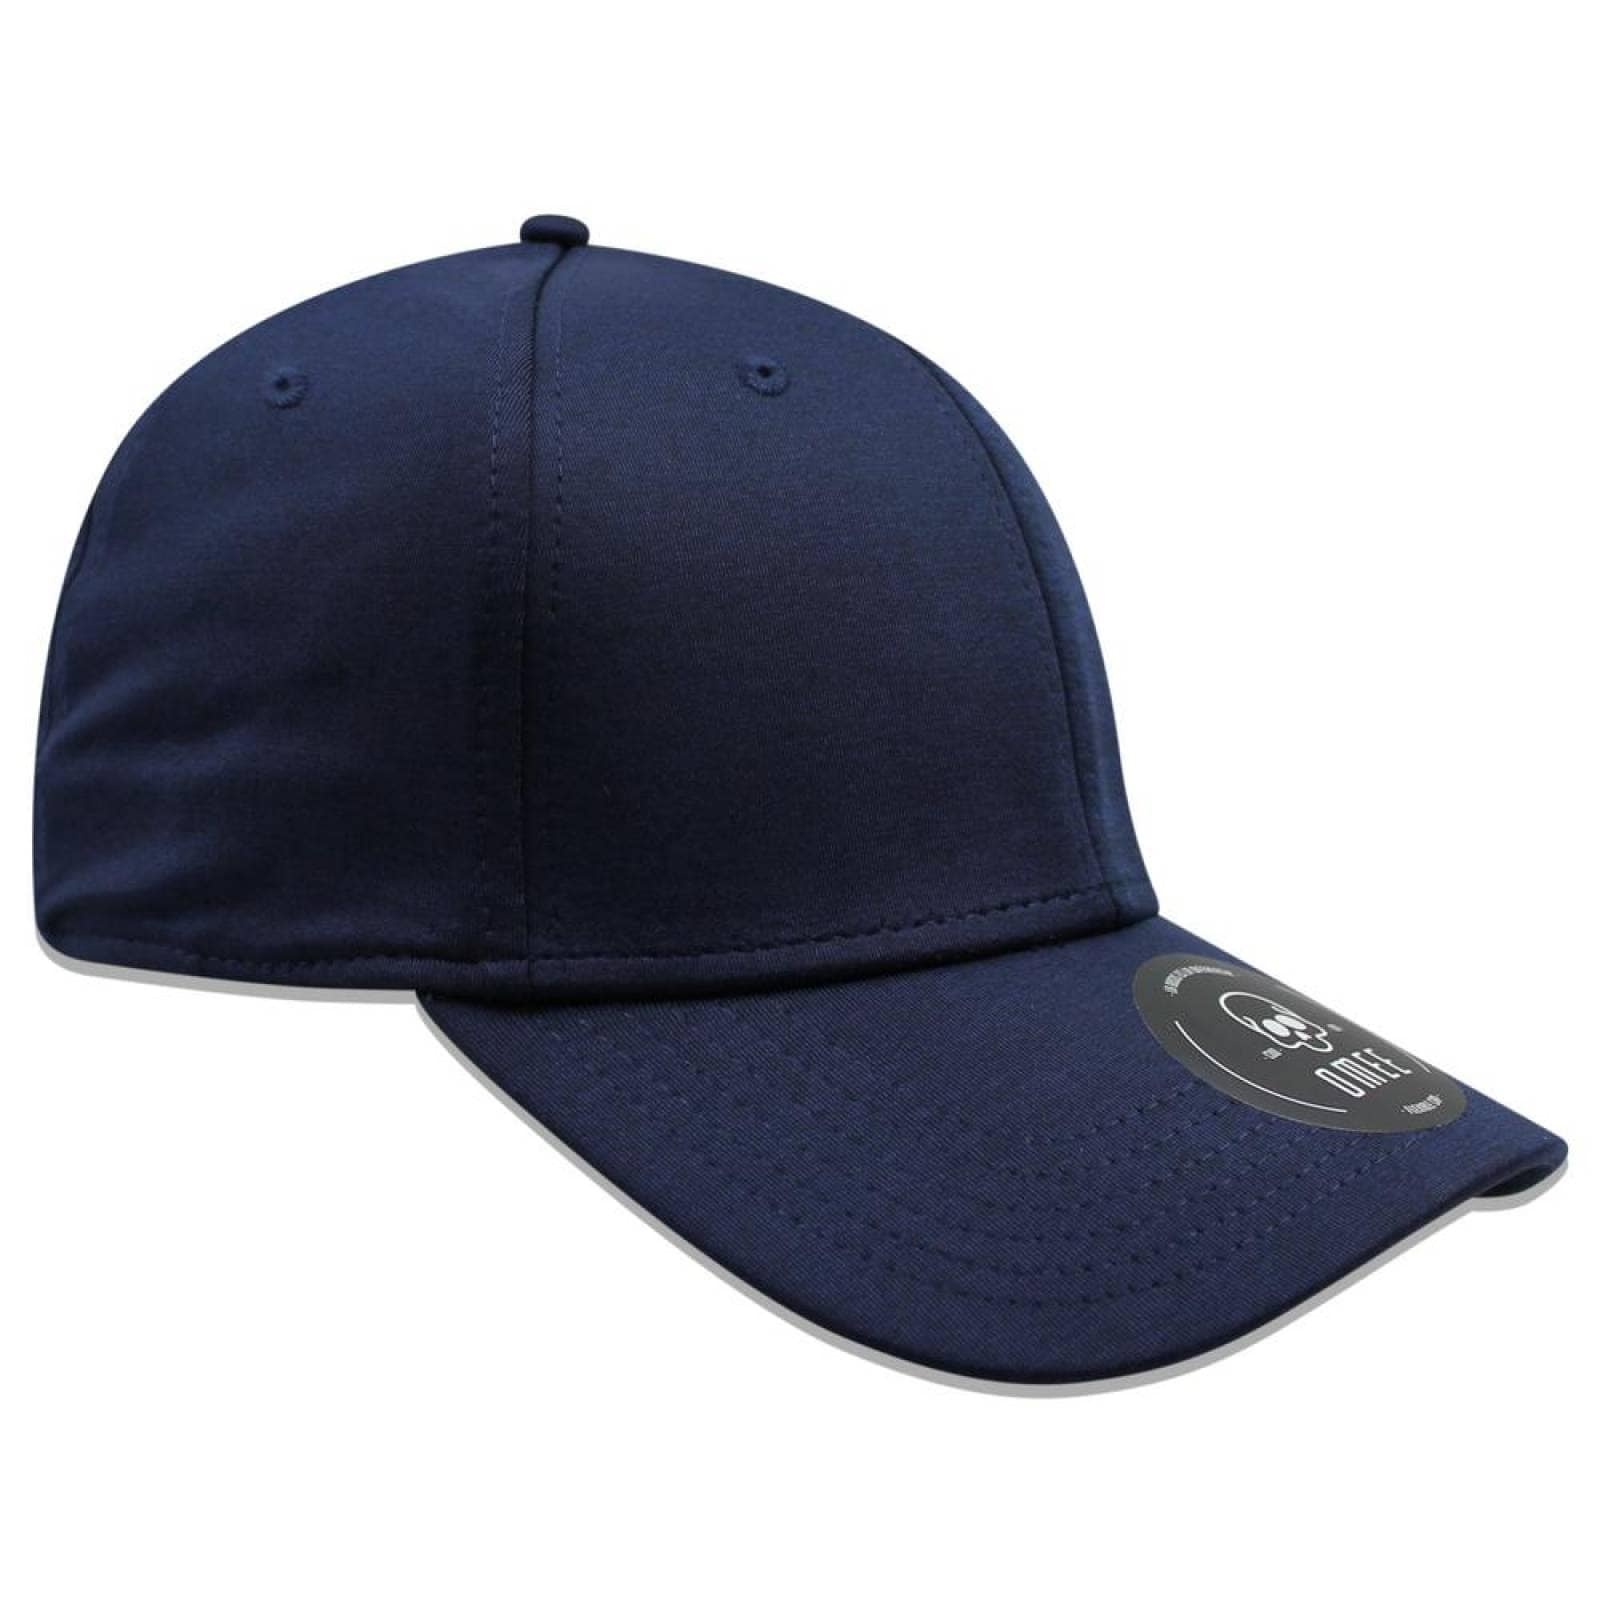 Gorra OMEE Curva Brezo Flex Azul Marino